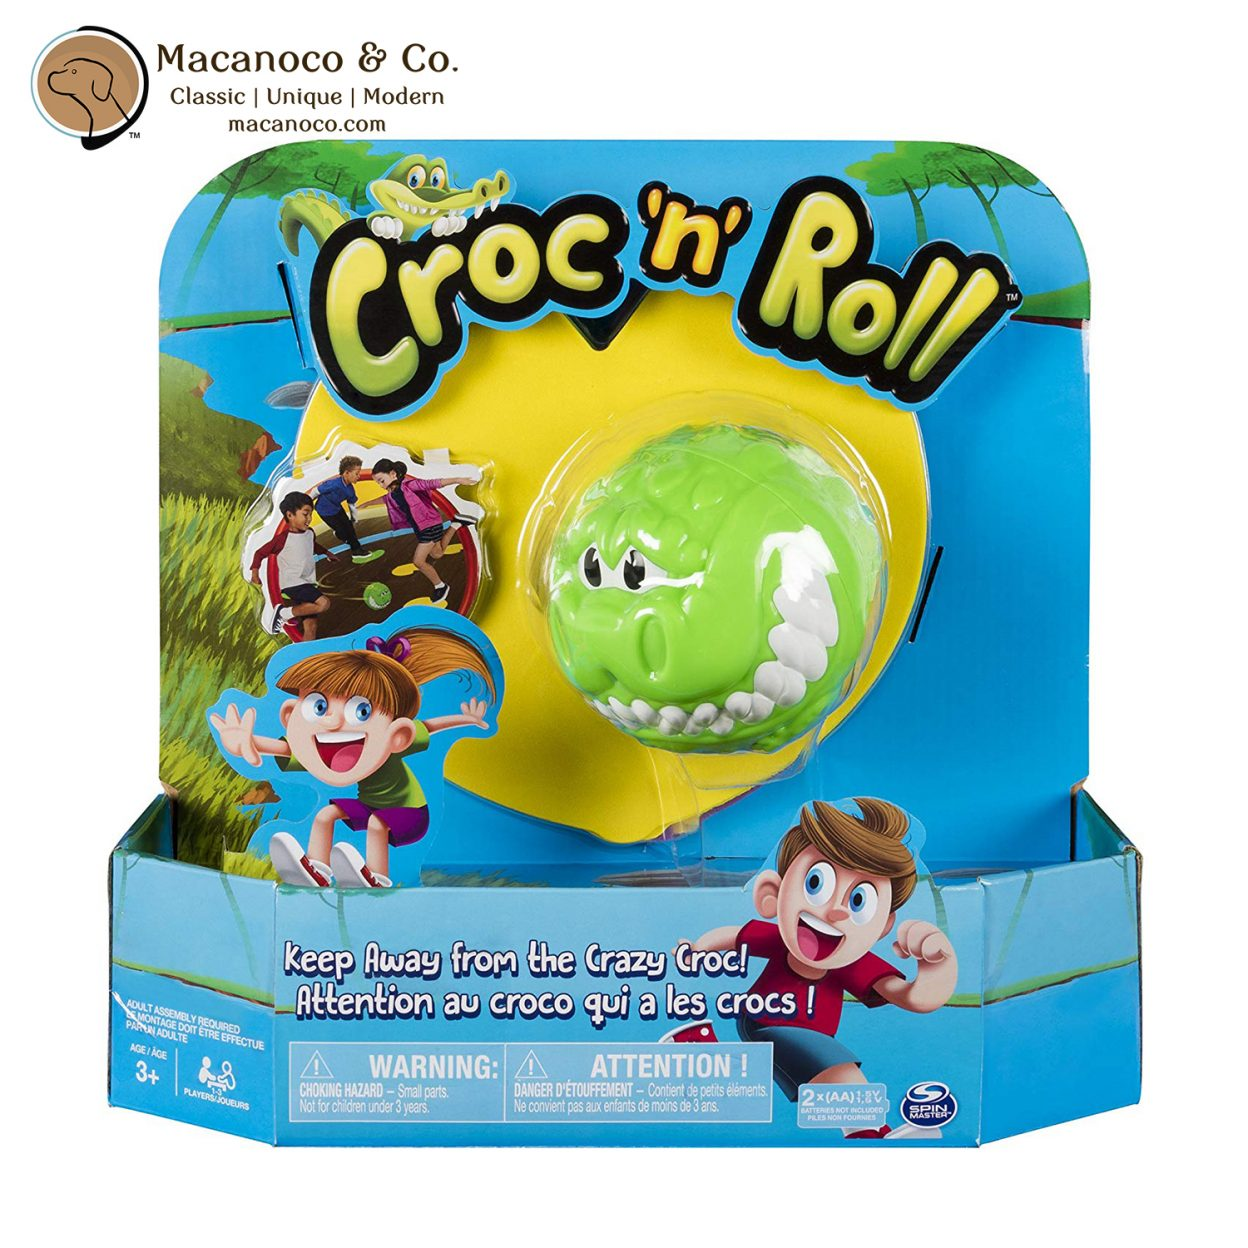 8081 Croc 'n' Roll 1